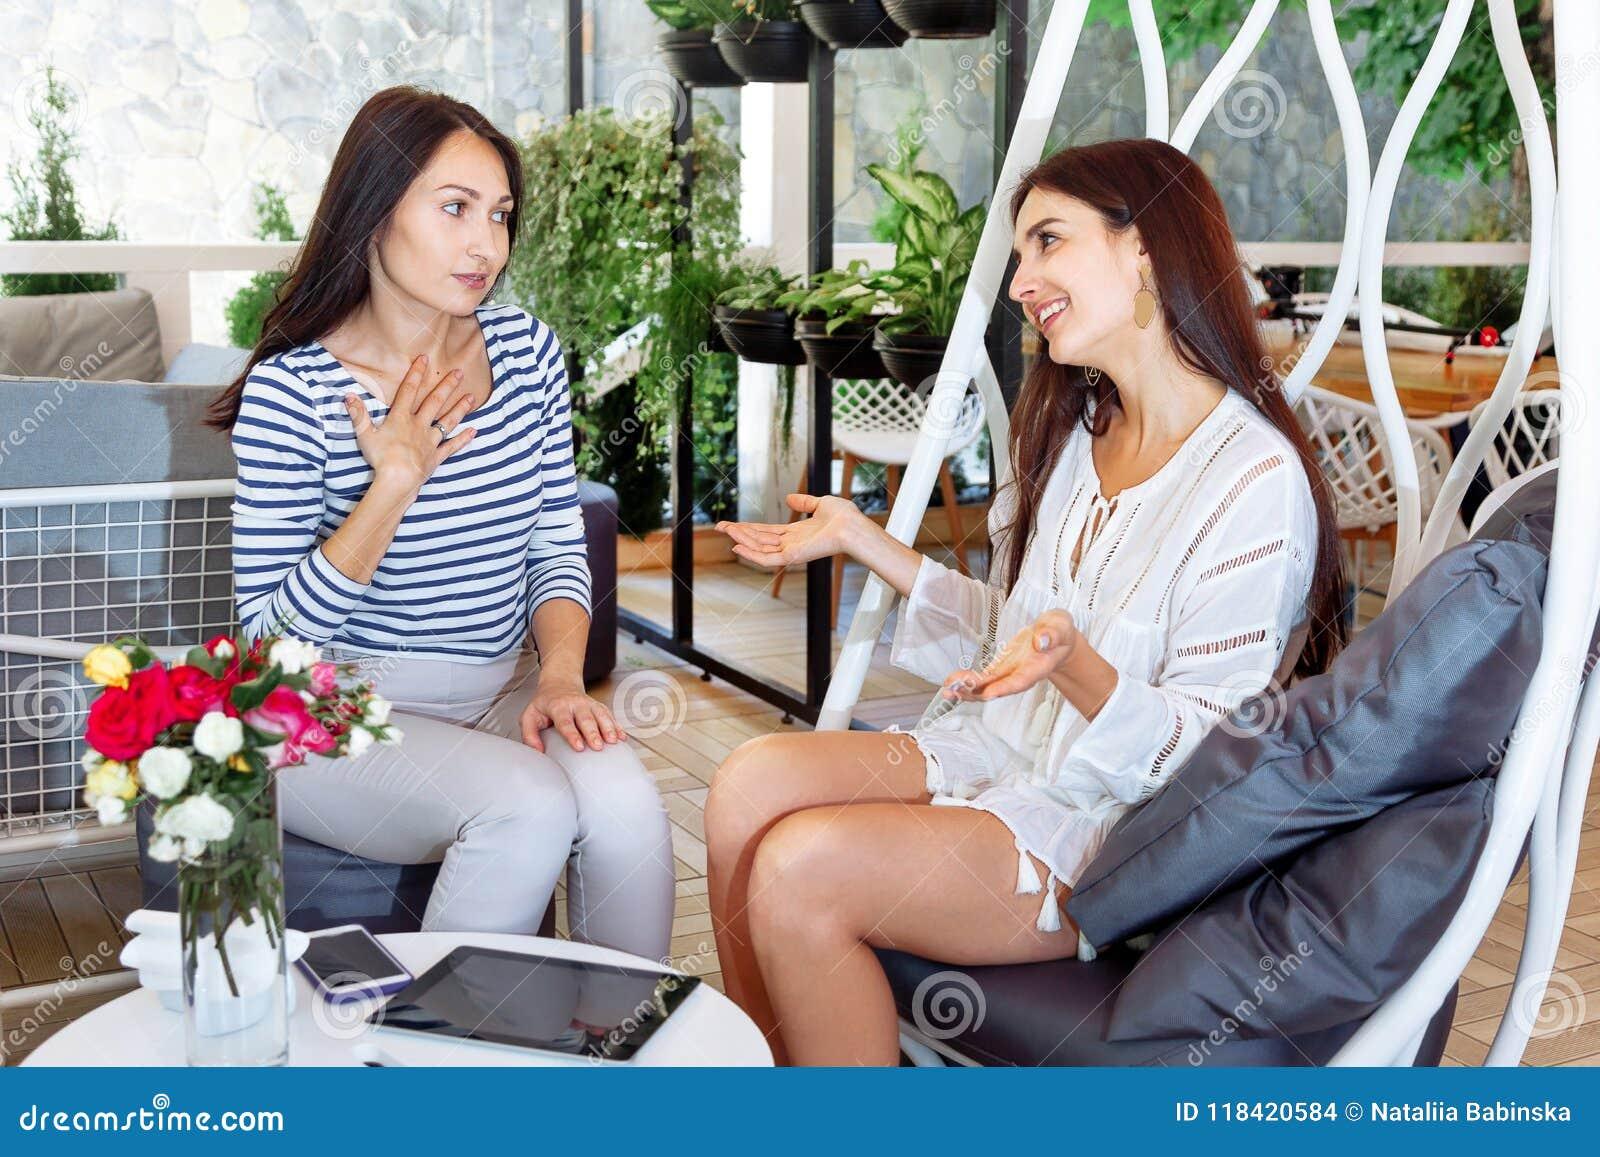 Amateur girlfriends blog think